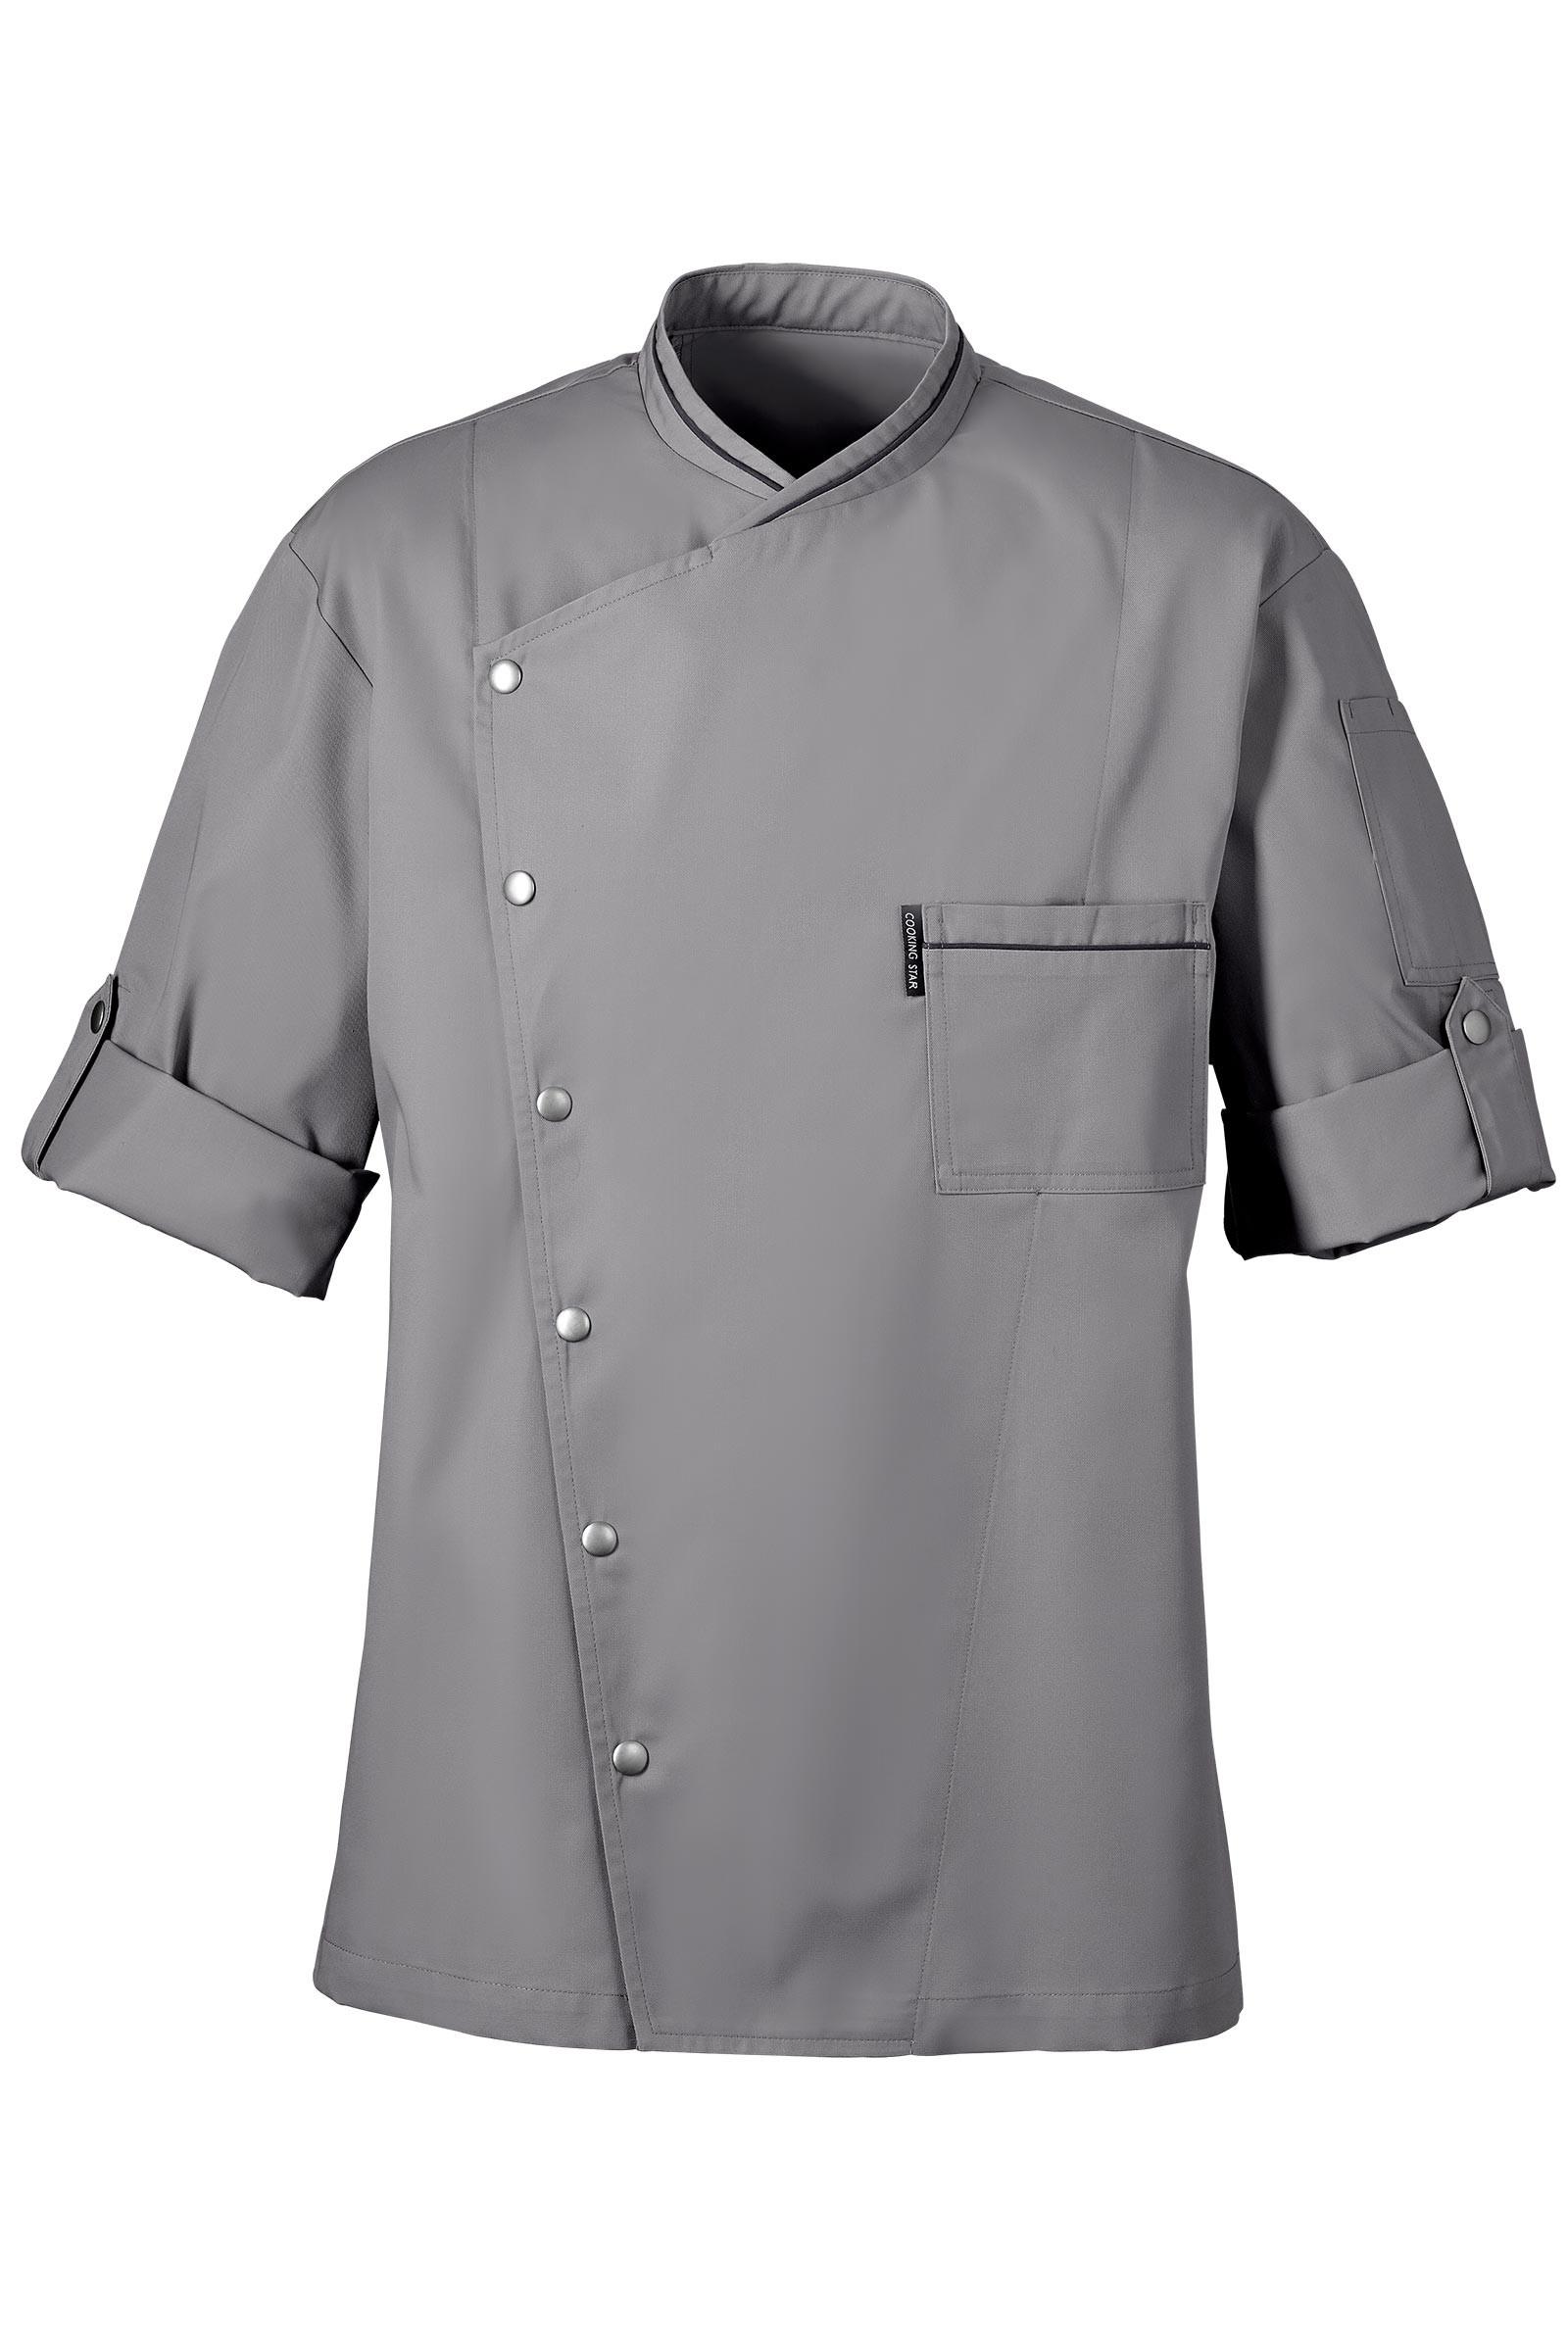 veste cuisine avec broderie,veste cuisine homme amazon,lavage ... - Broderie Veste De Cuisine